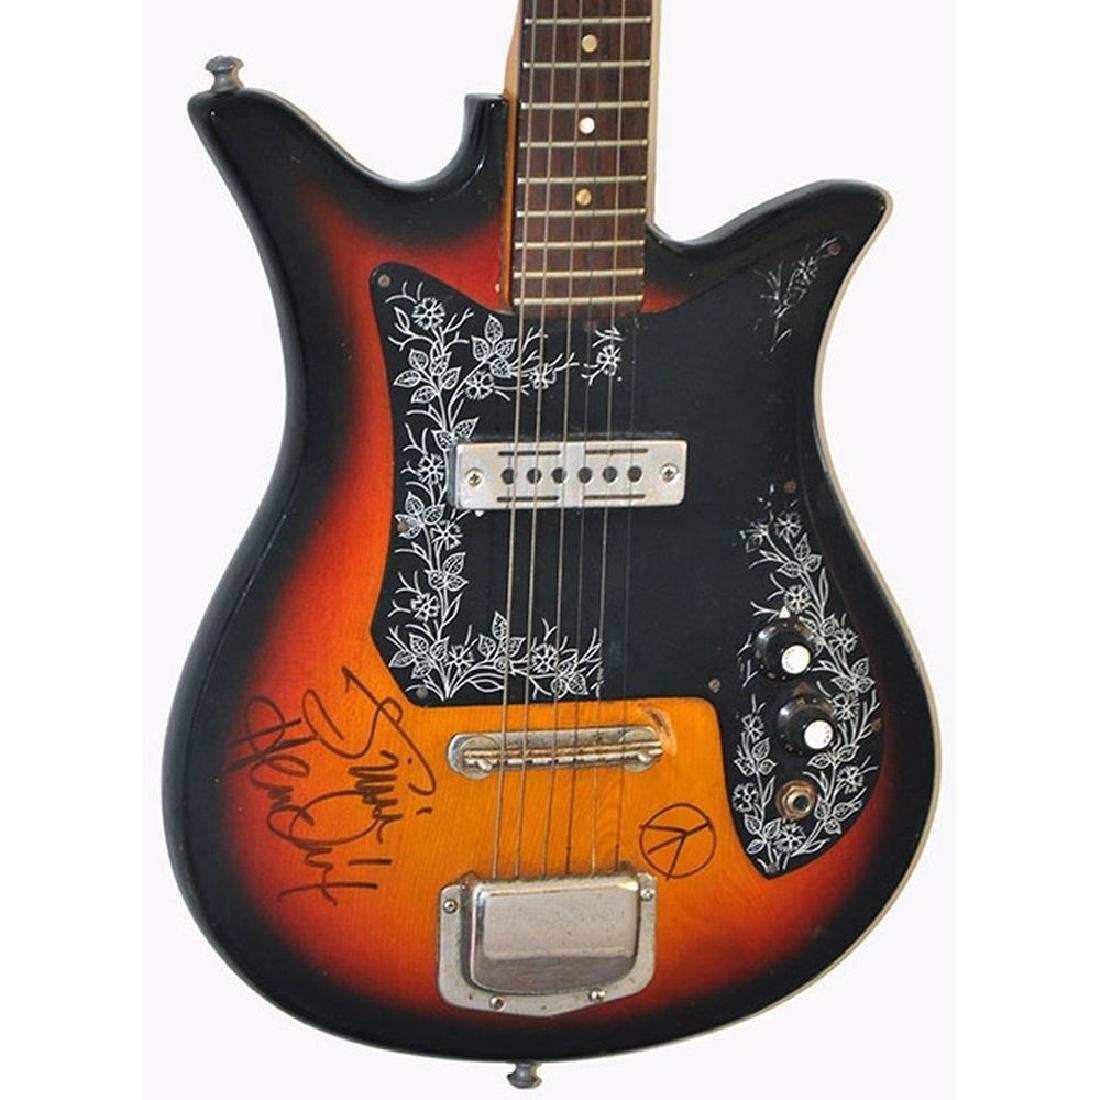 Jimi Hendrix Signed Guitar